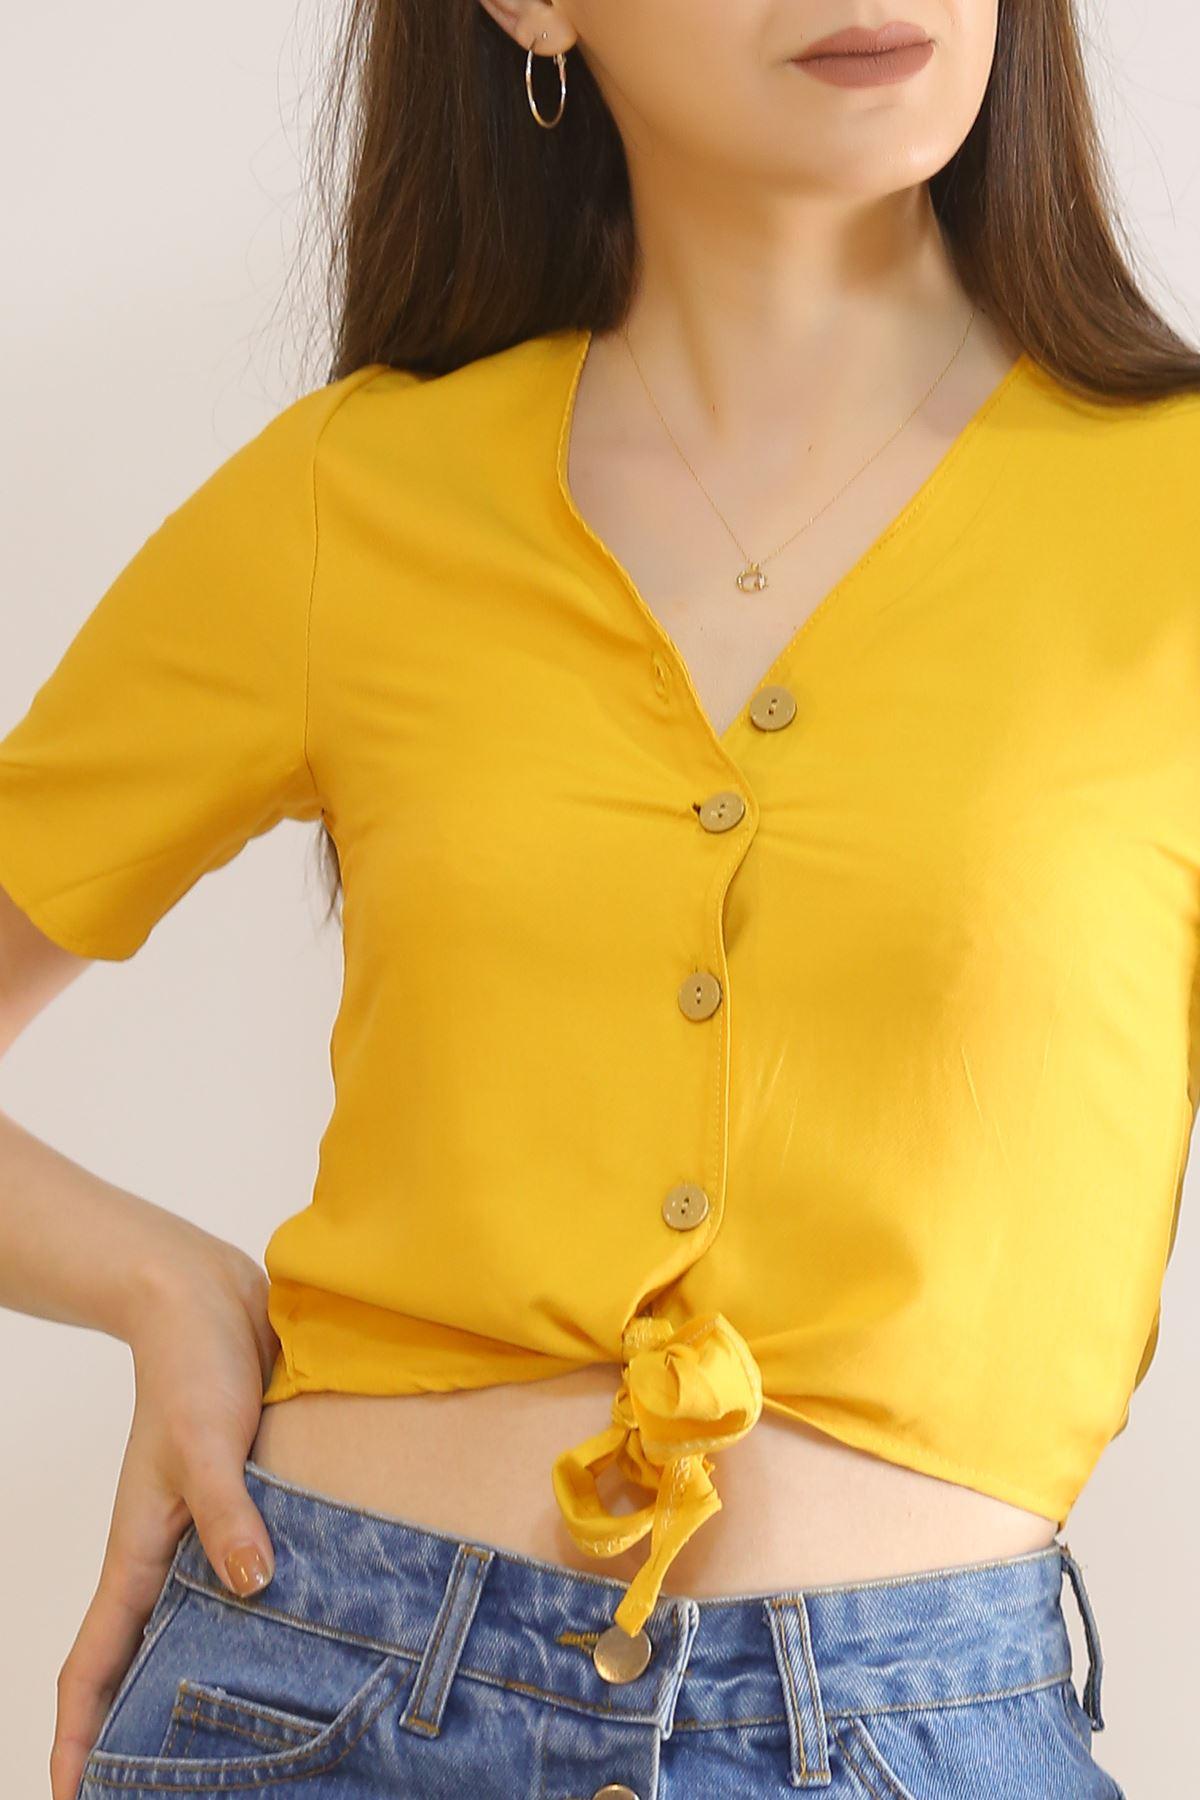 Altı Bağlamalı Bluz Sarı - 5835.1153.